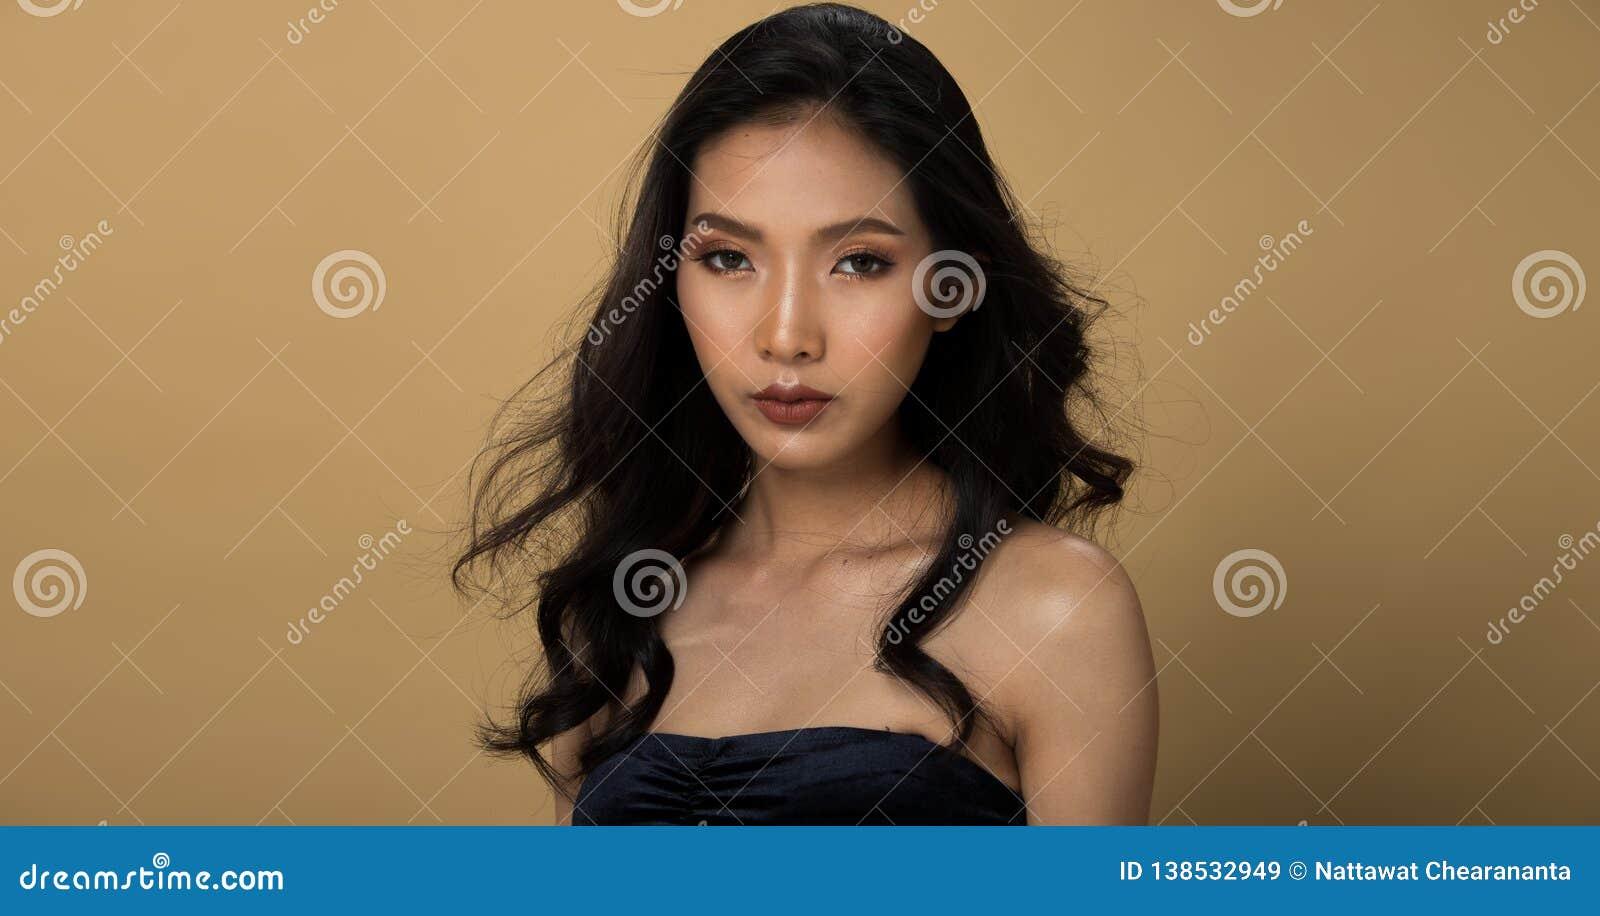 Fashion Asian Woman Tan skin black hair eyes